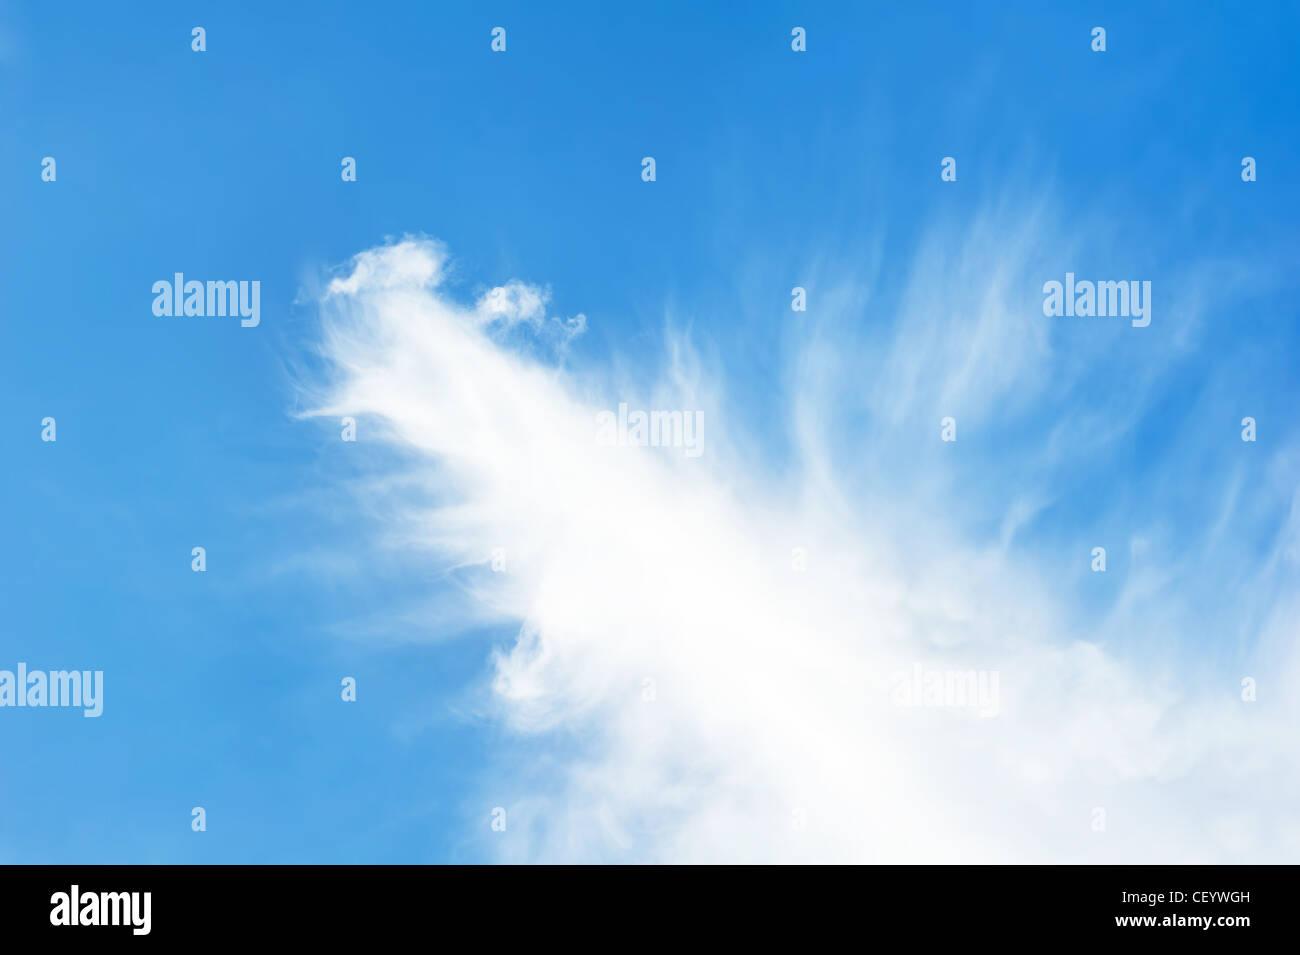 Wispy cloud - Stock Image